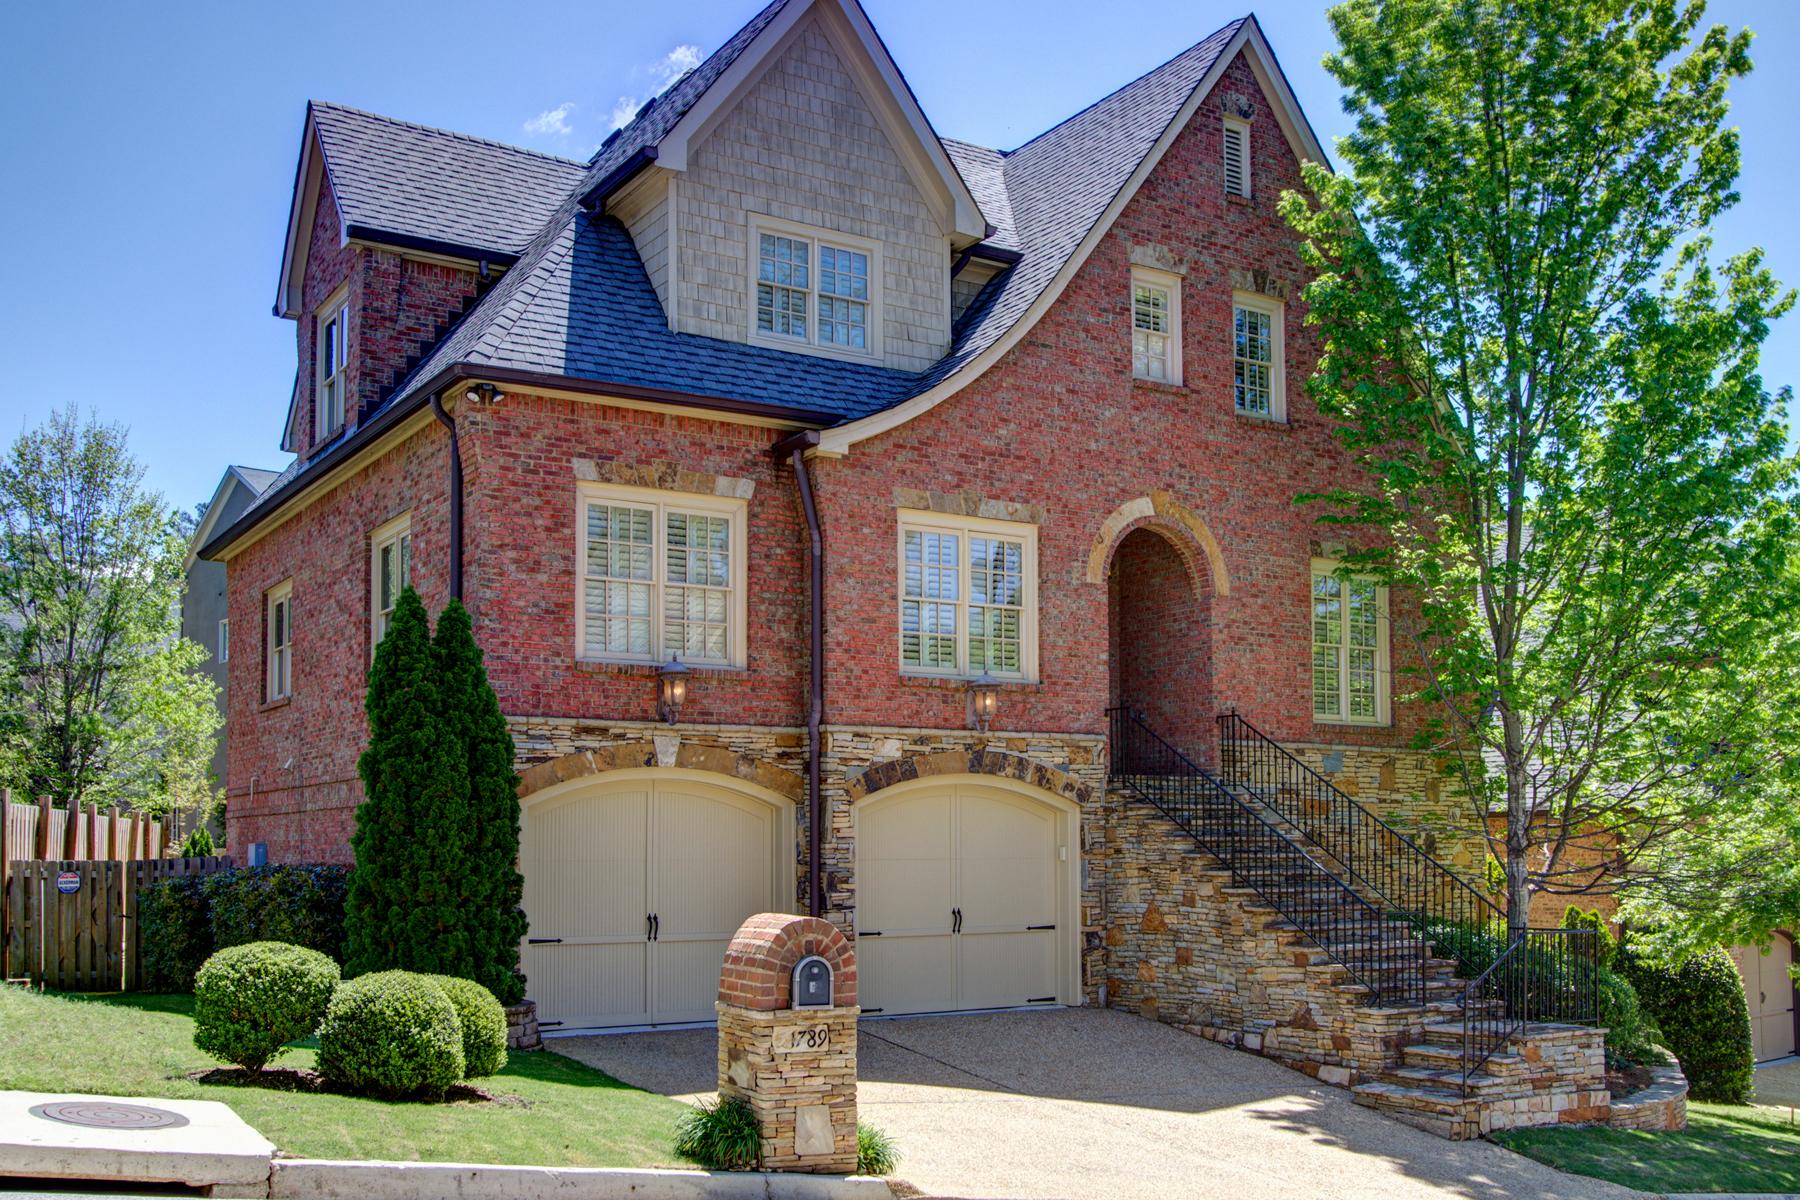 独户住宅 为 销售 在 Refined Brick and Stone Executive Home in Charming Brookhaven Setting 1789 Buckhead Valley Lane NE 亚特兰大, 乔治亚州, 30324 美国